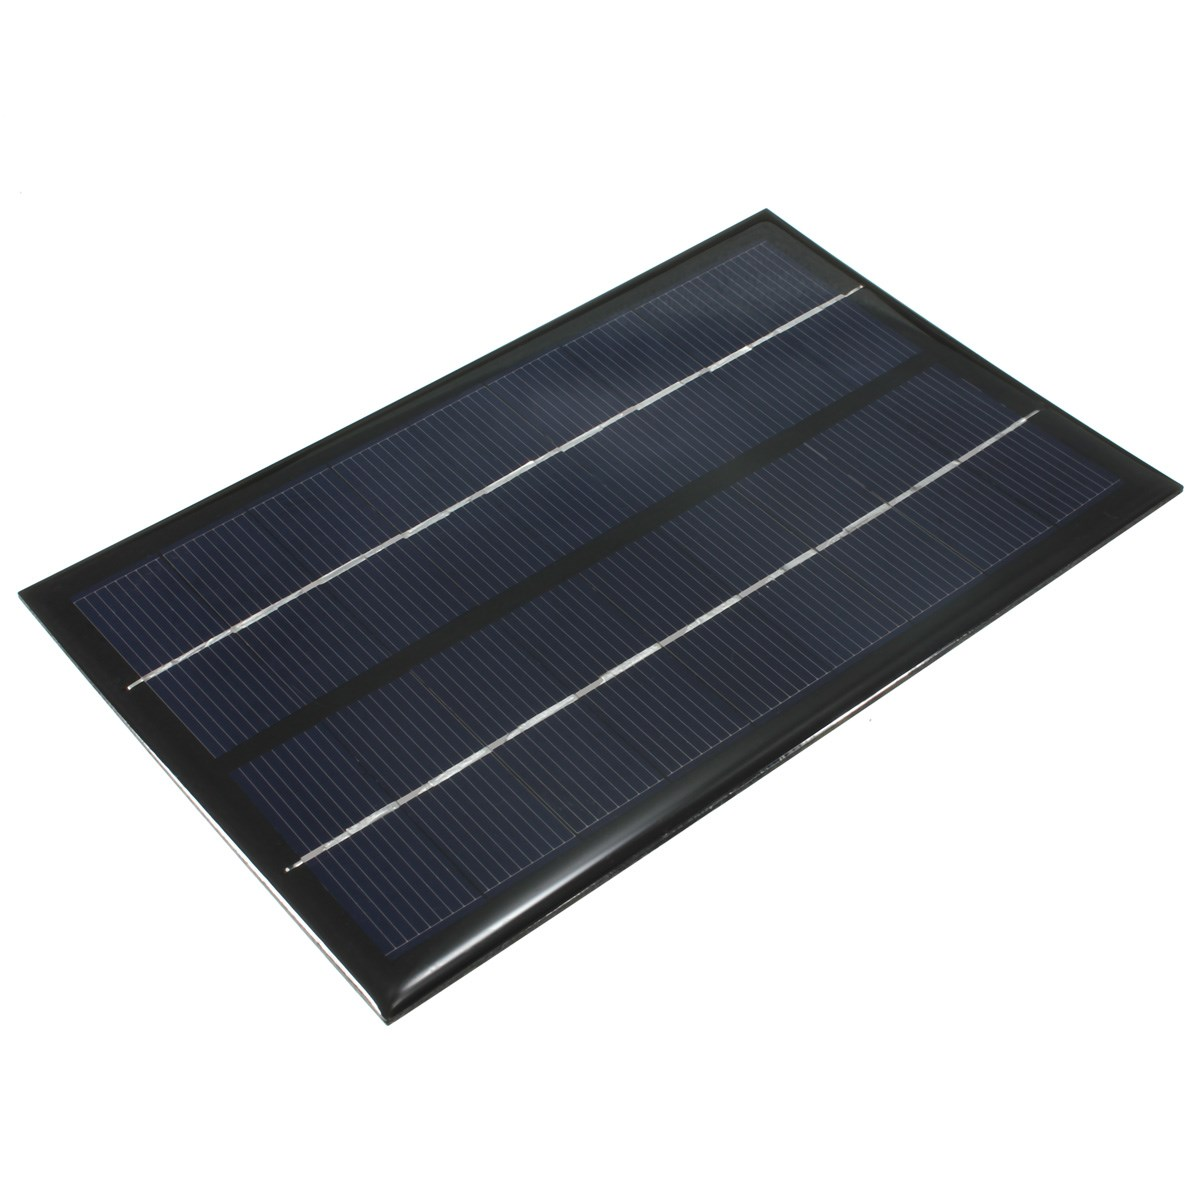 Compra paneles solares peque os online al por mayor de for Panel solar pequeno